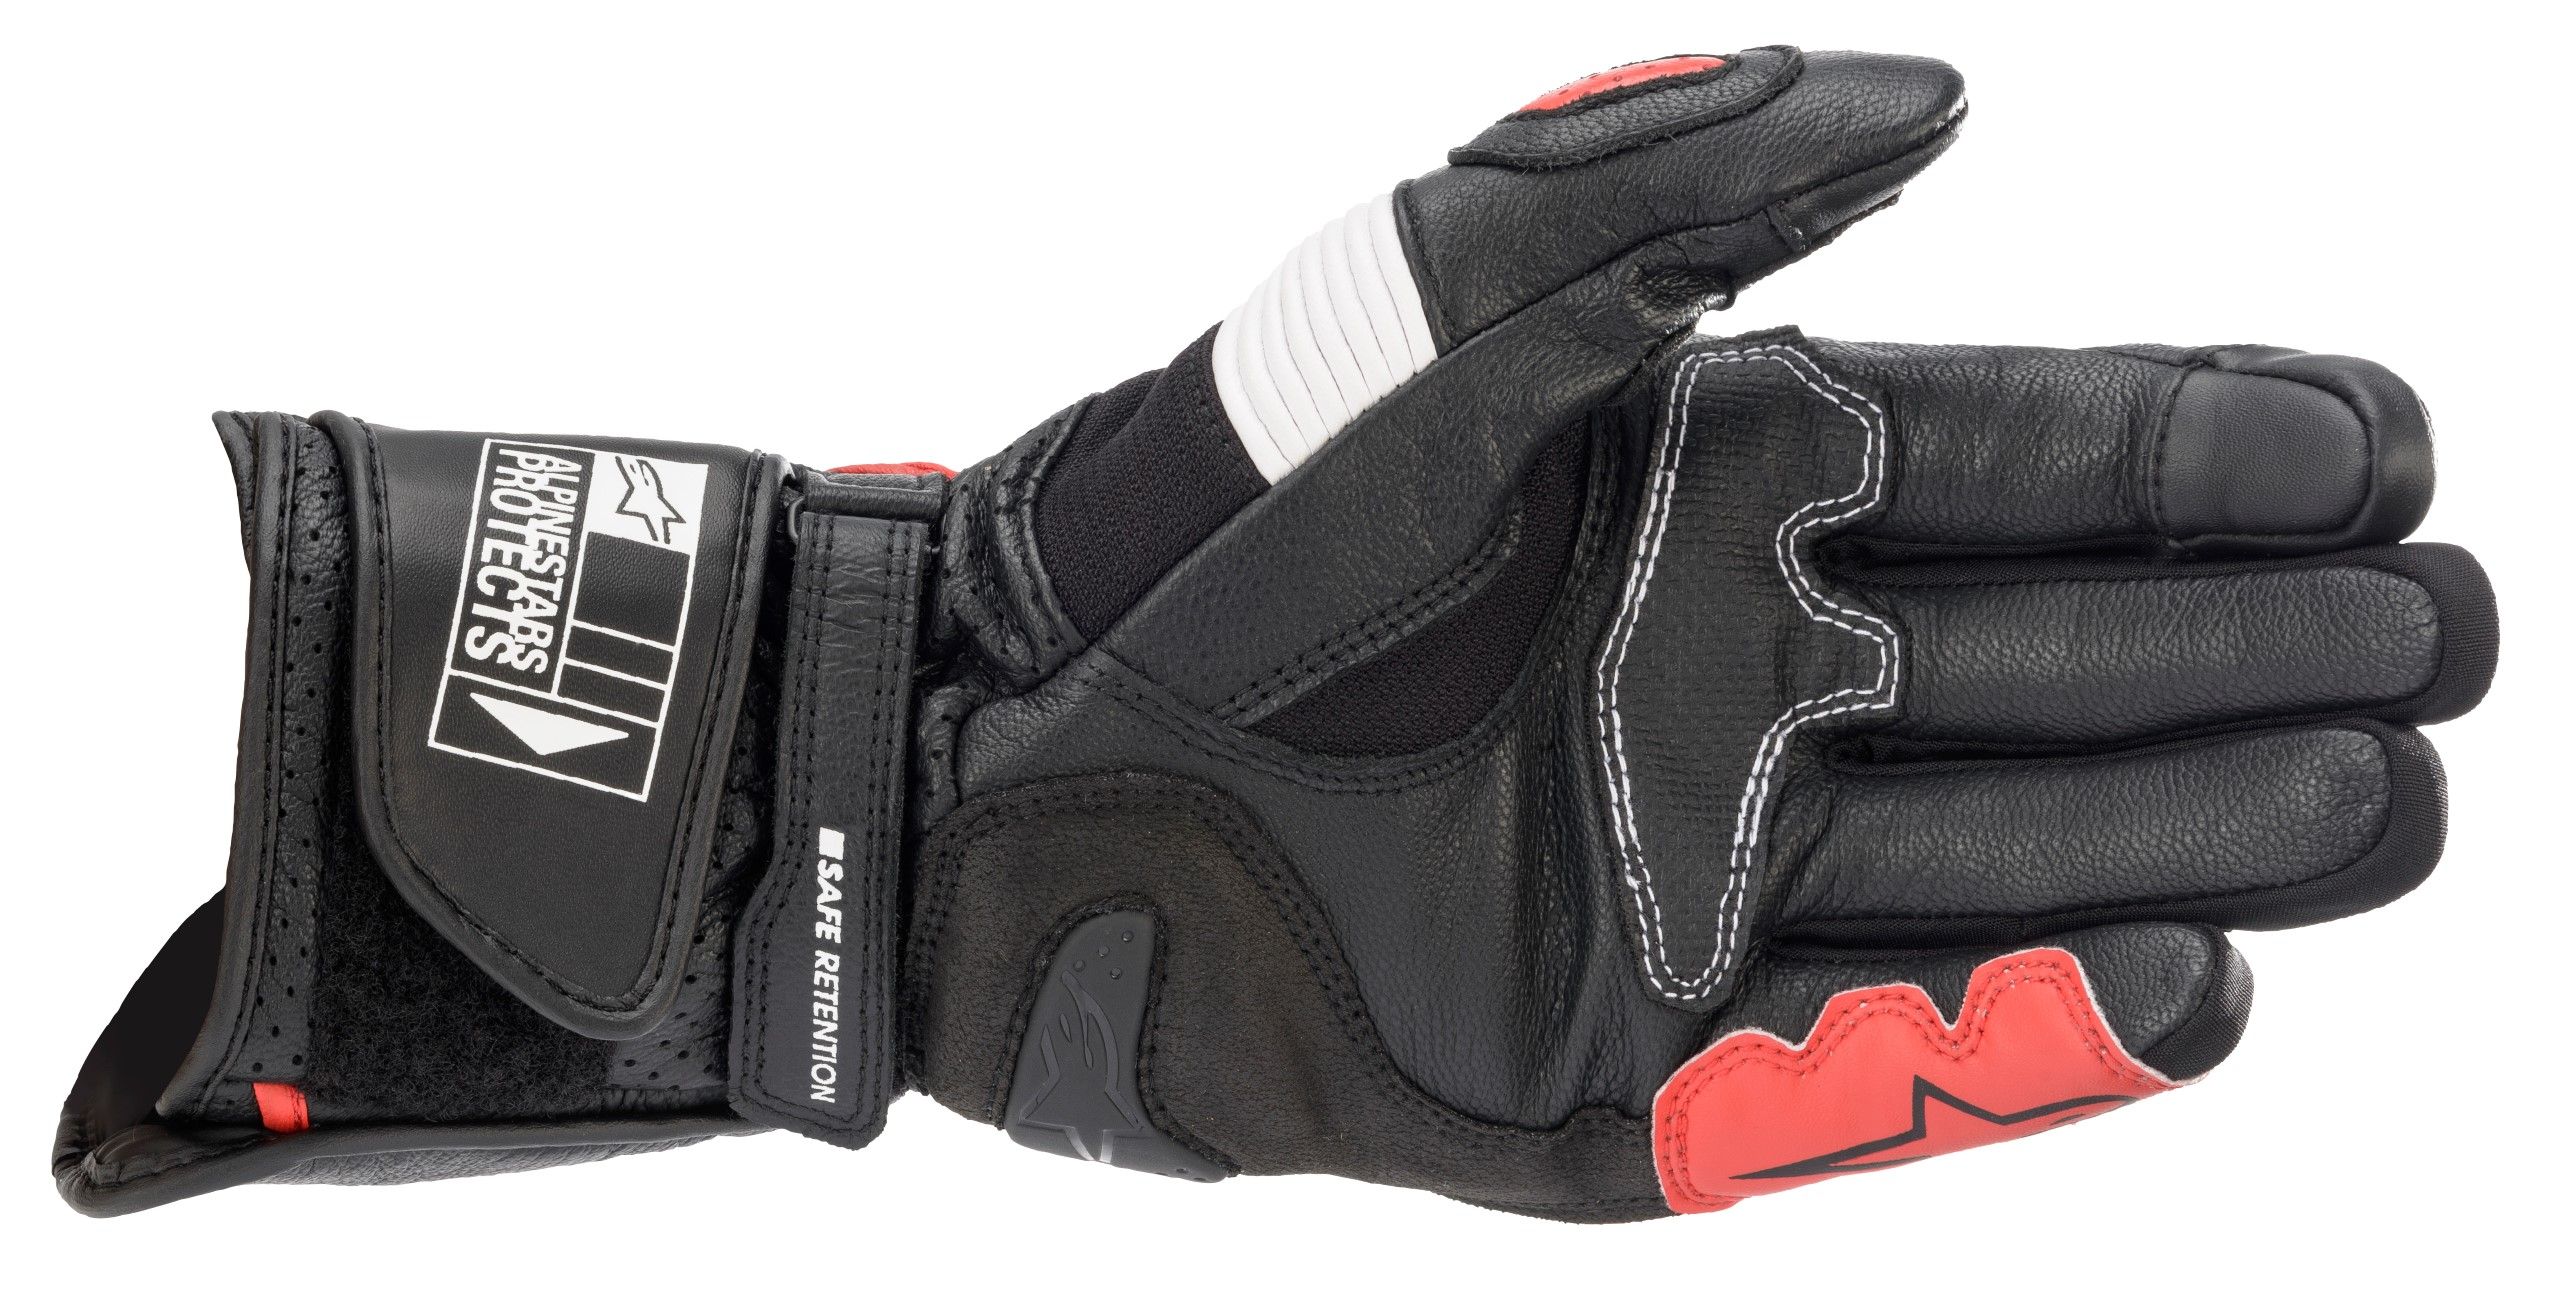 3558221-1304-ba_sp-2-v3-glove